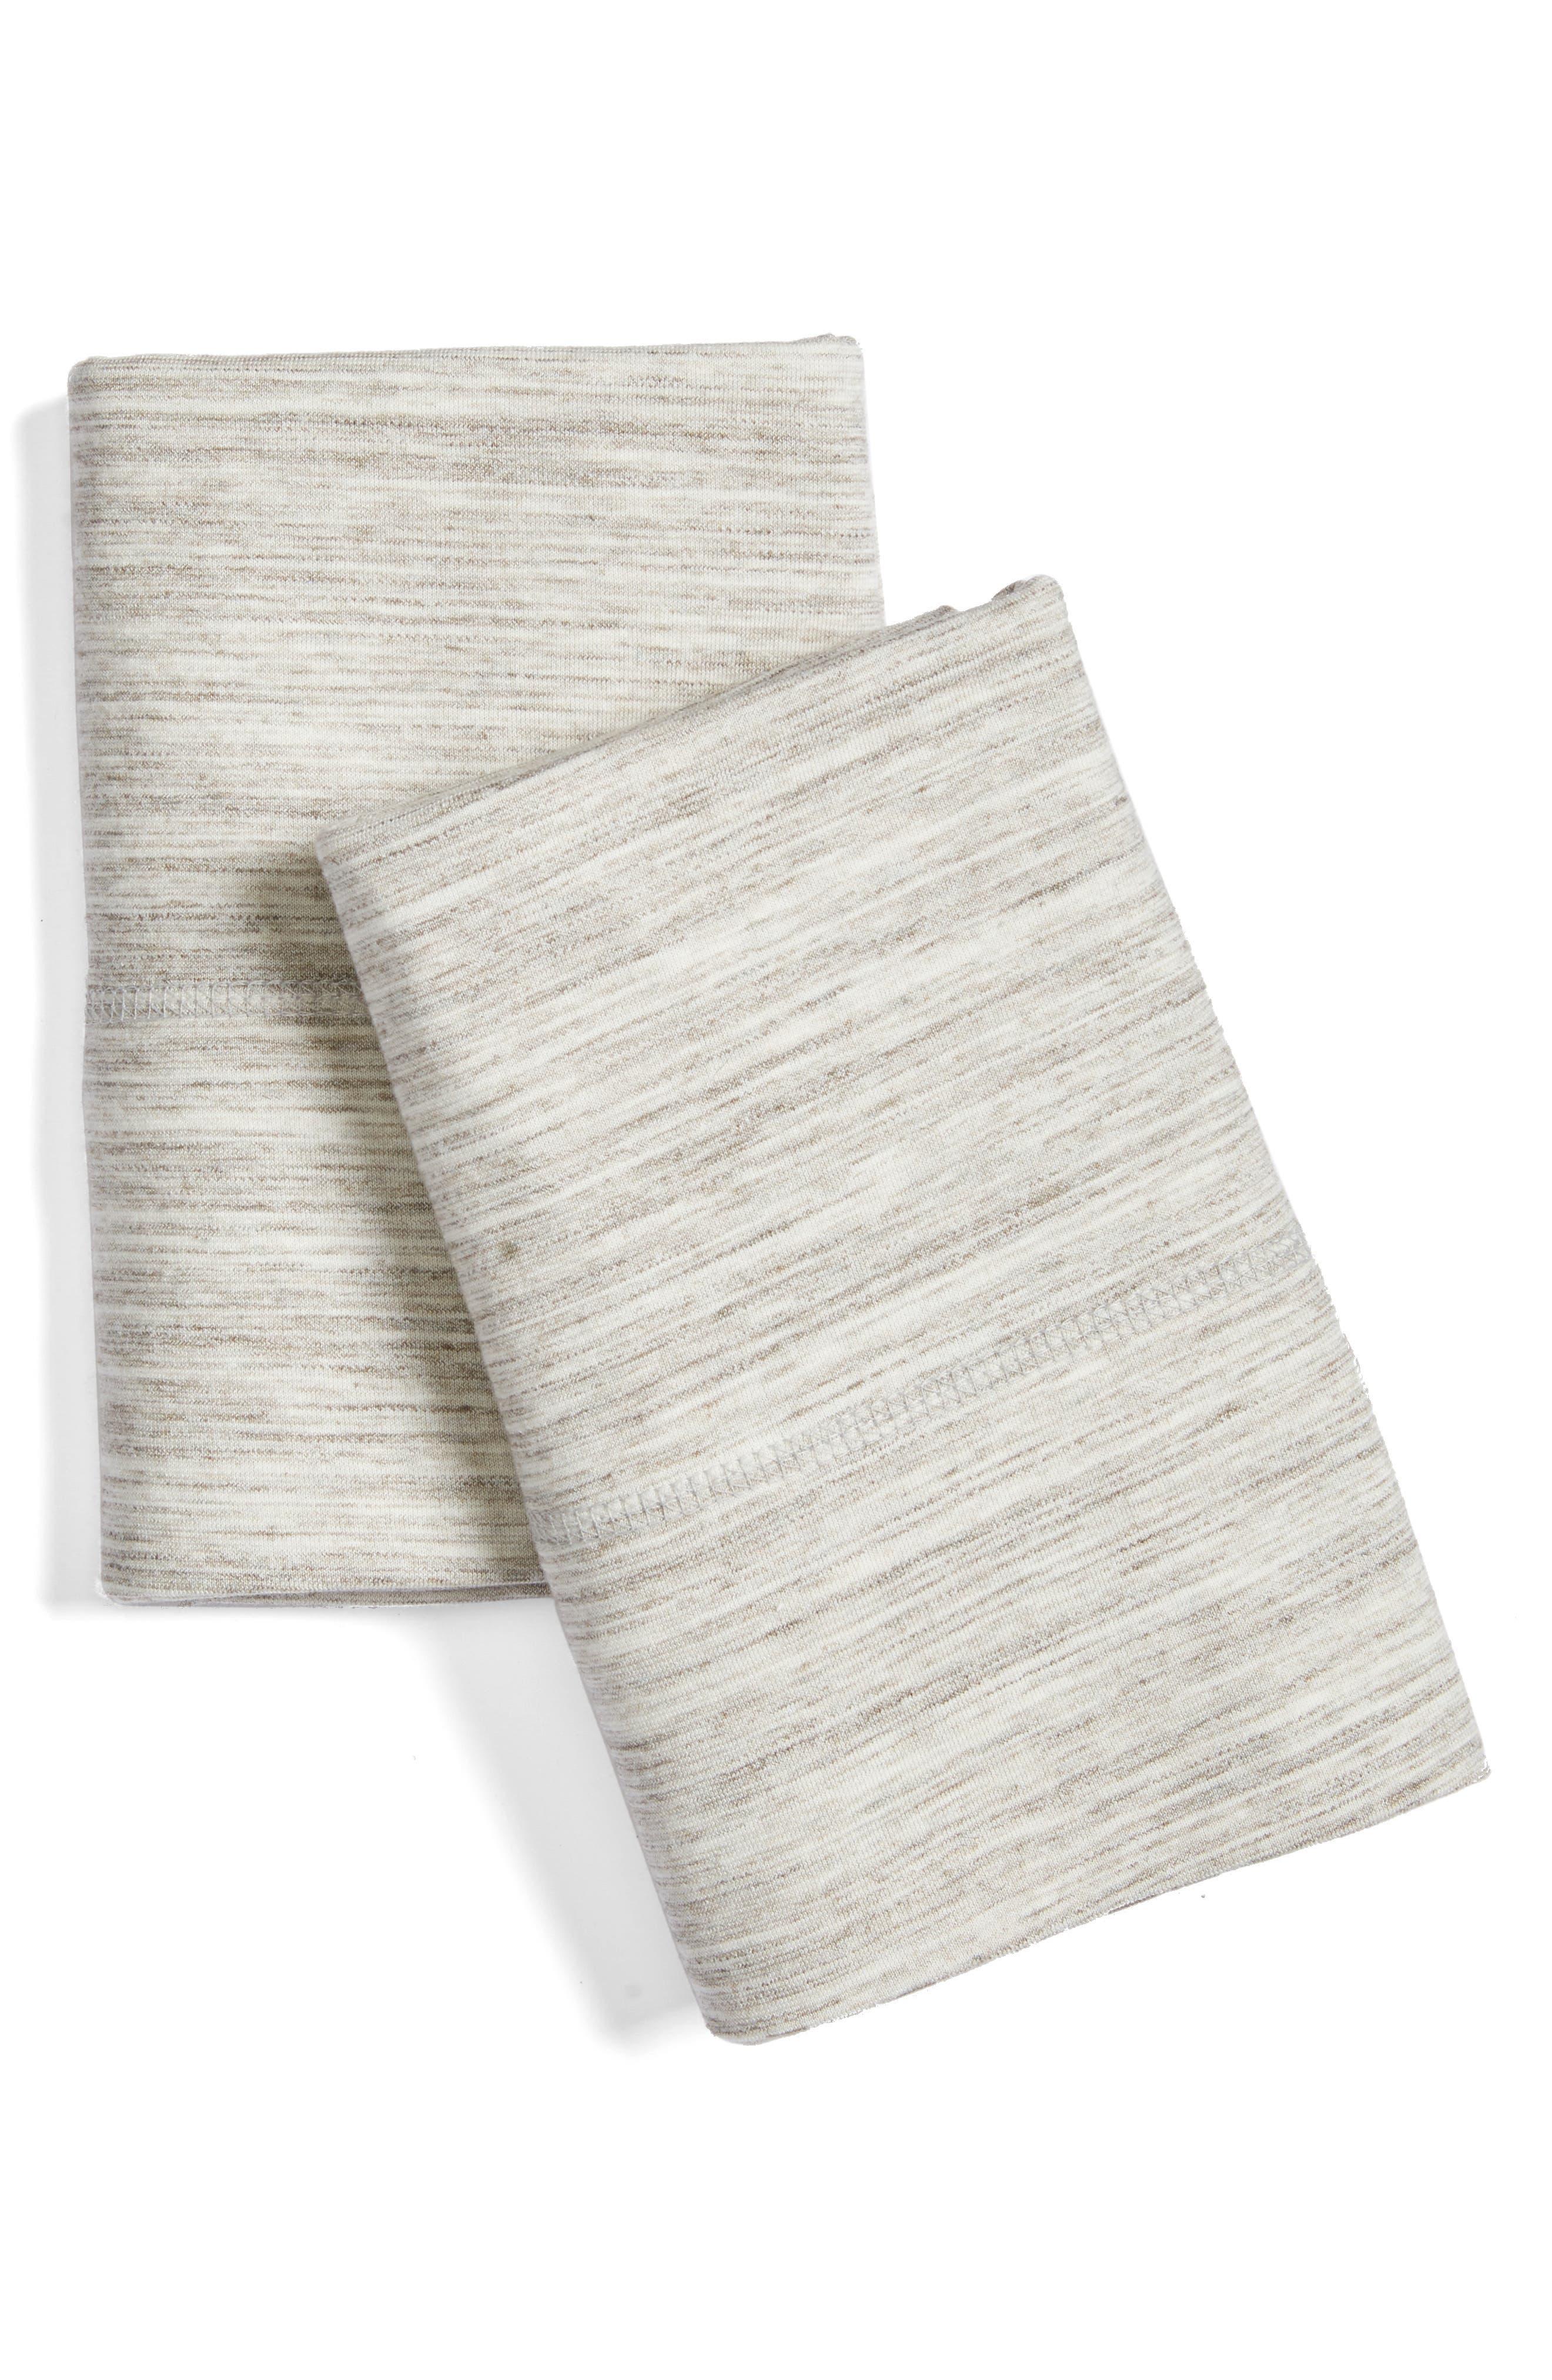 Strata Pillowcases,                         Main,                         color, Sand Wash